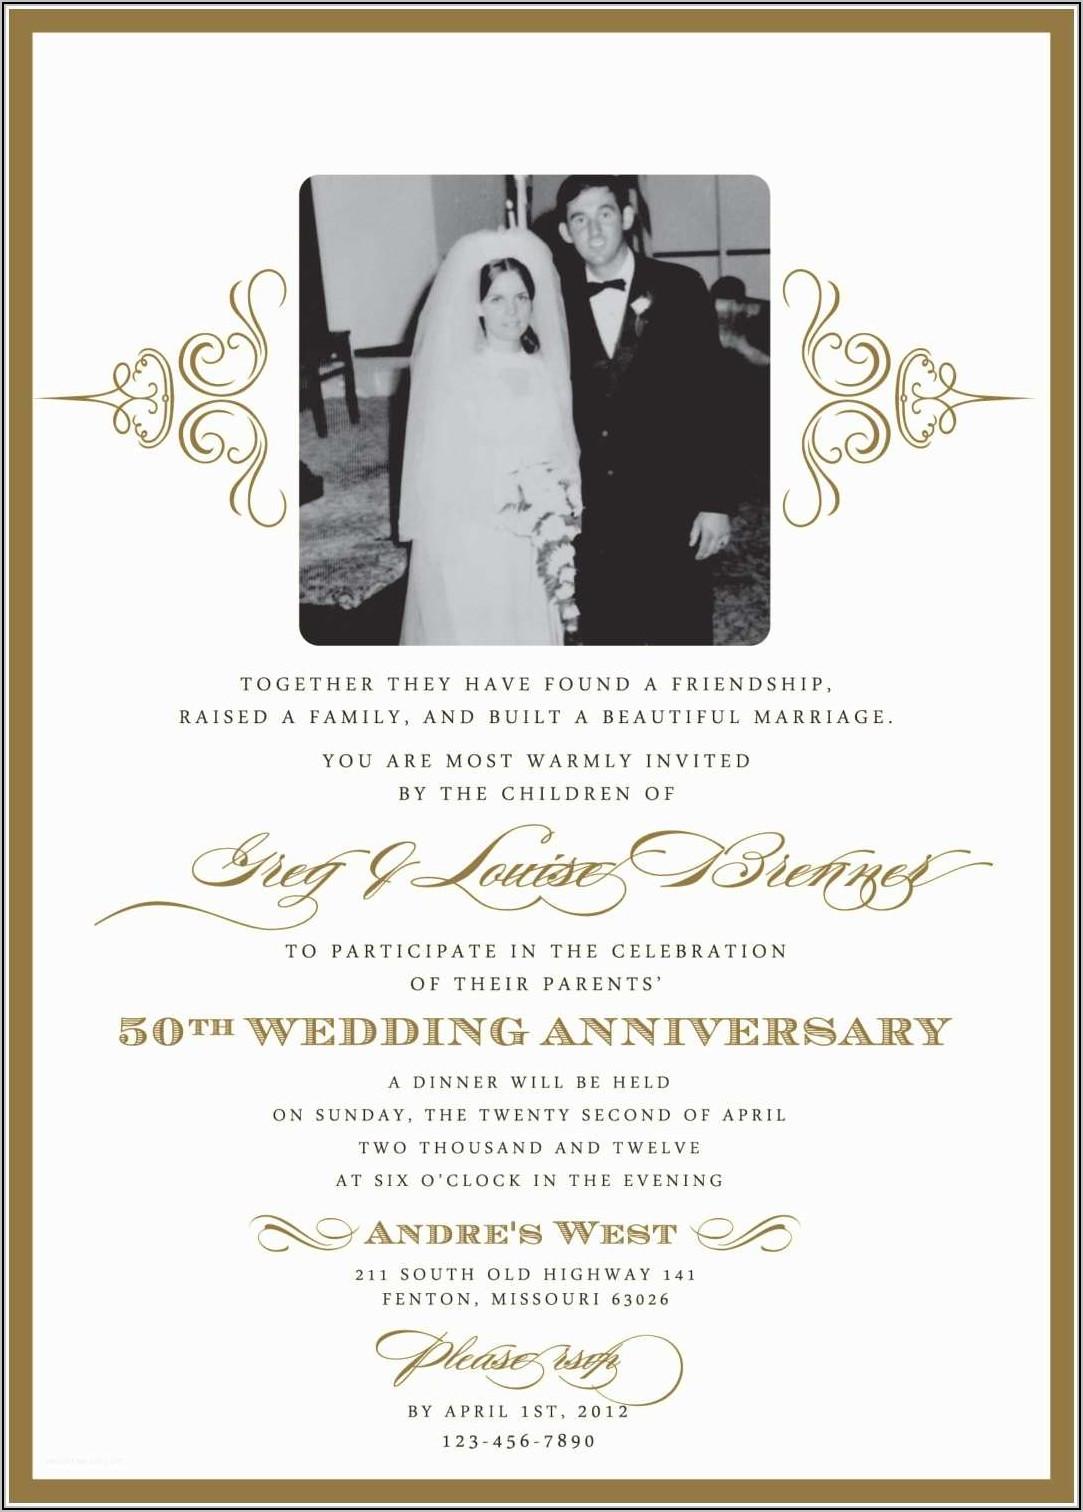 50th Wedding Anniversary Party Invitation Templates